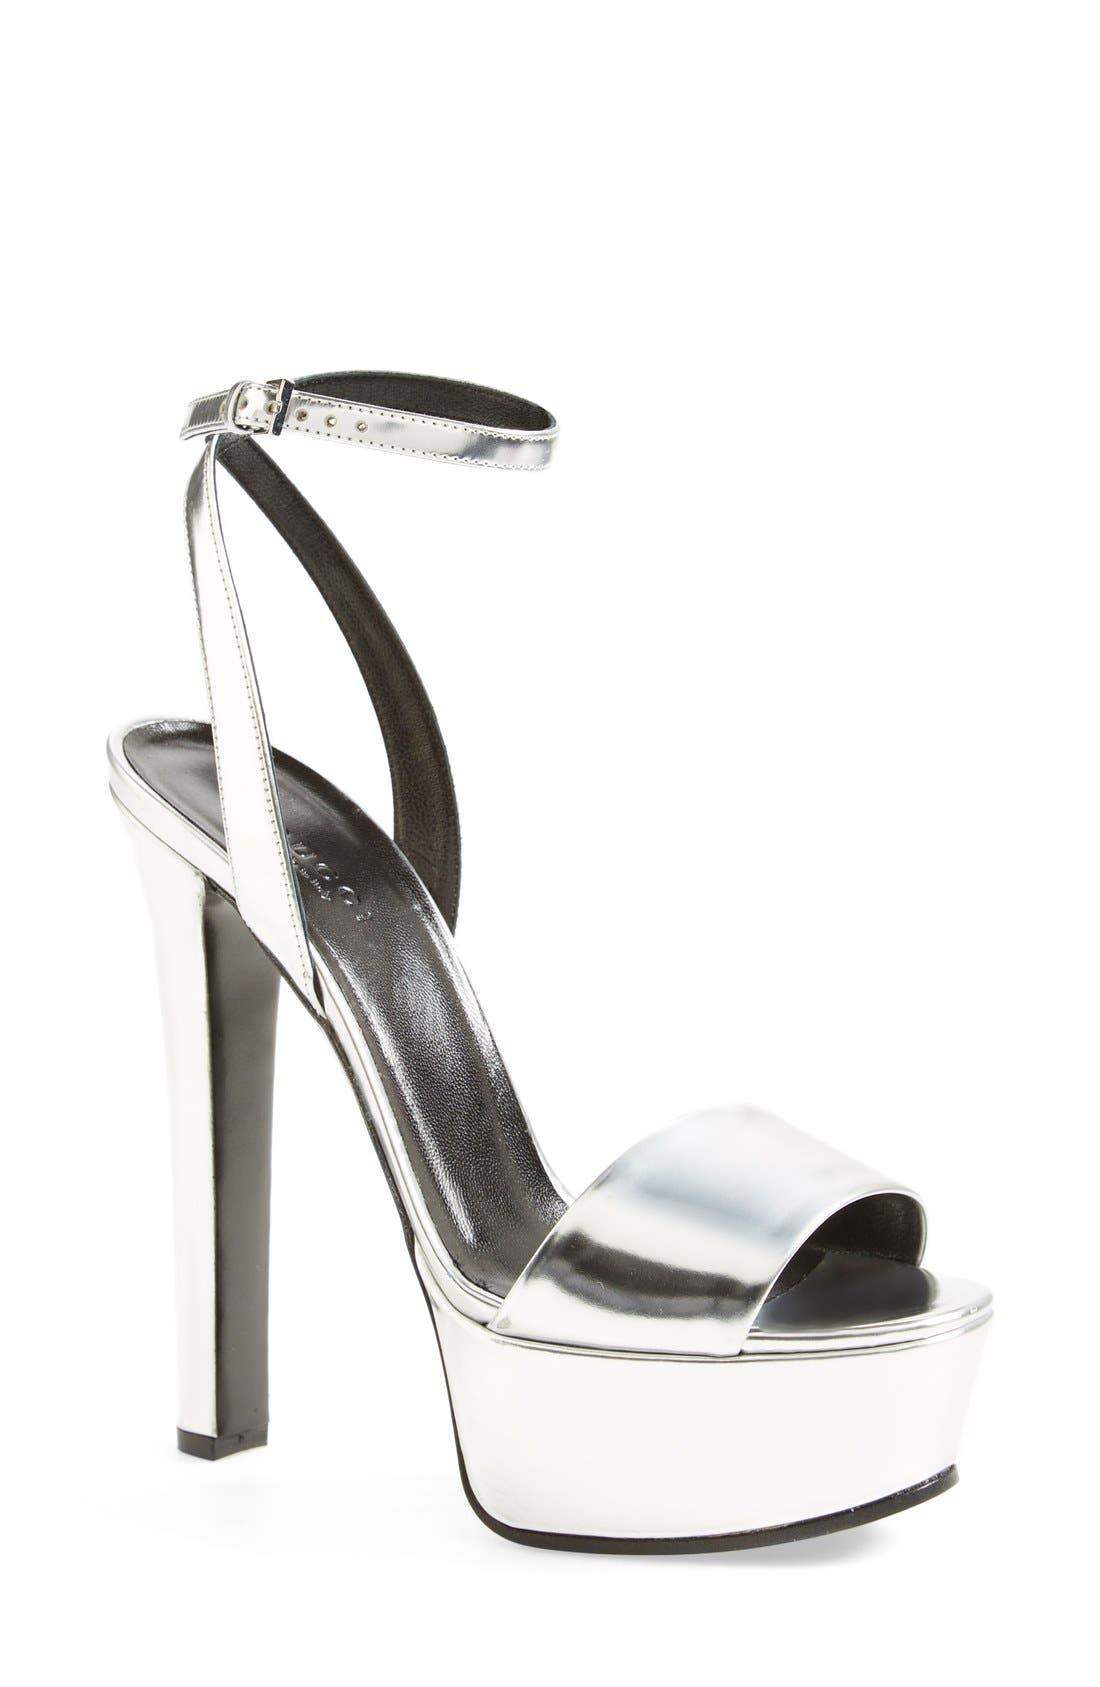 Alternate Image 1 Selected - Gucci 'Leila' Metallic Platform Sandal (Women)